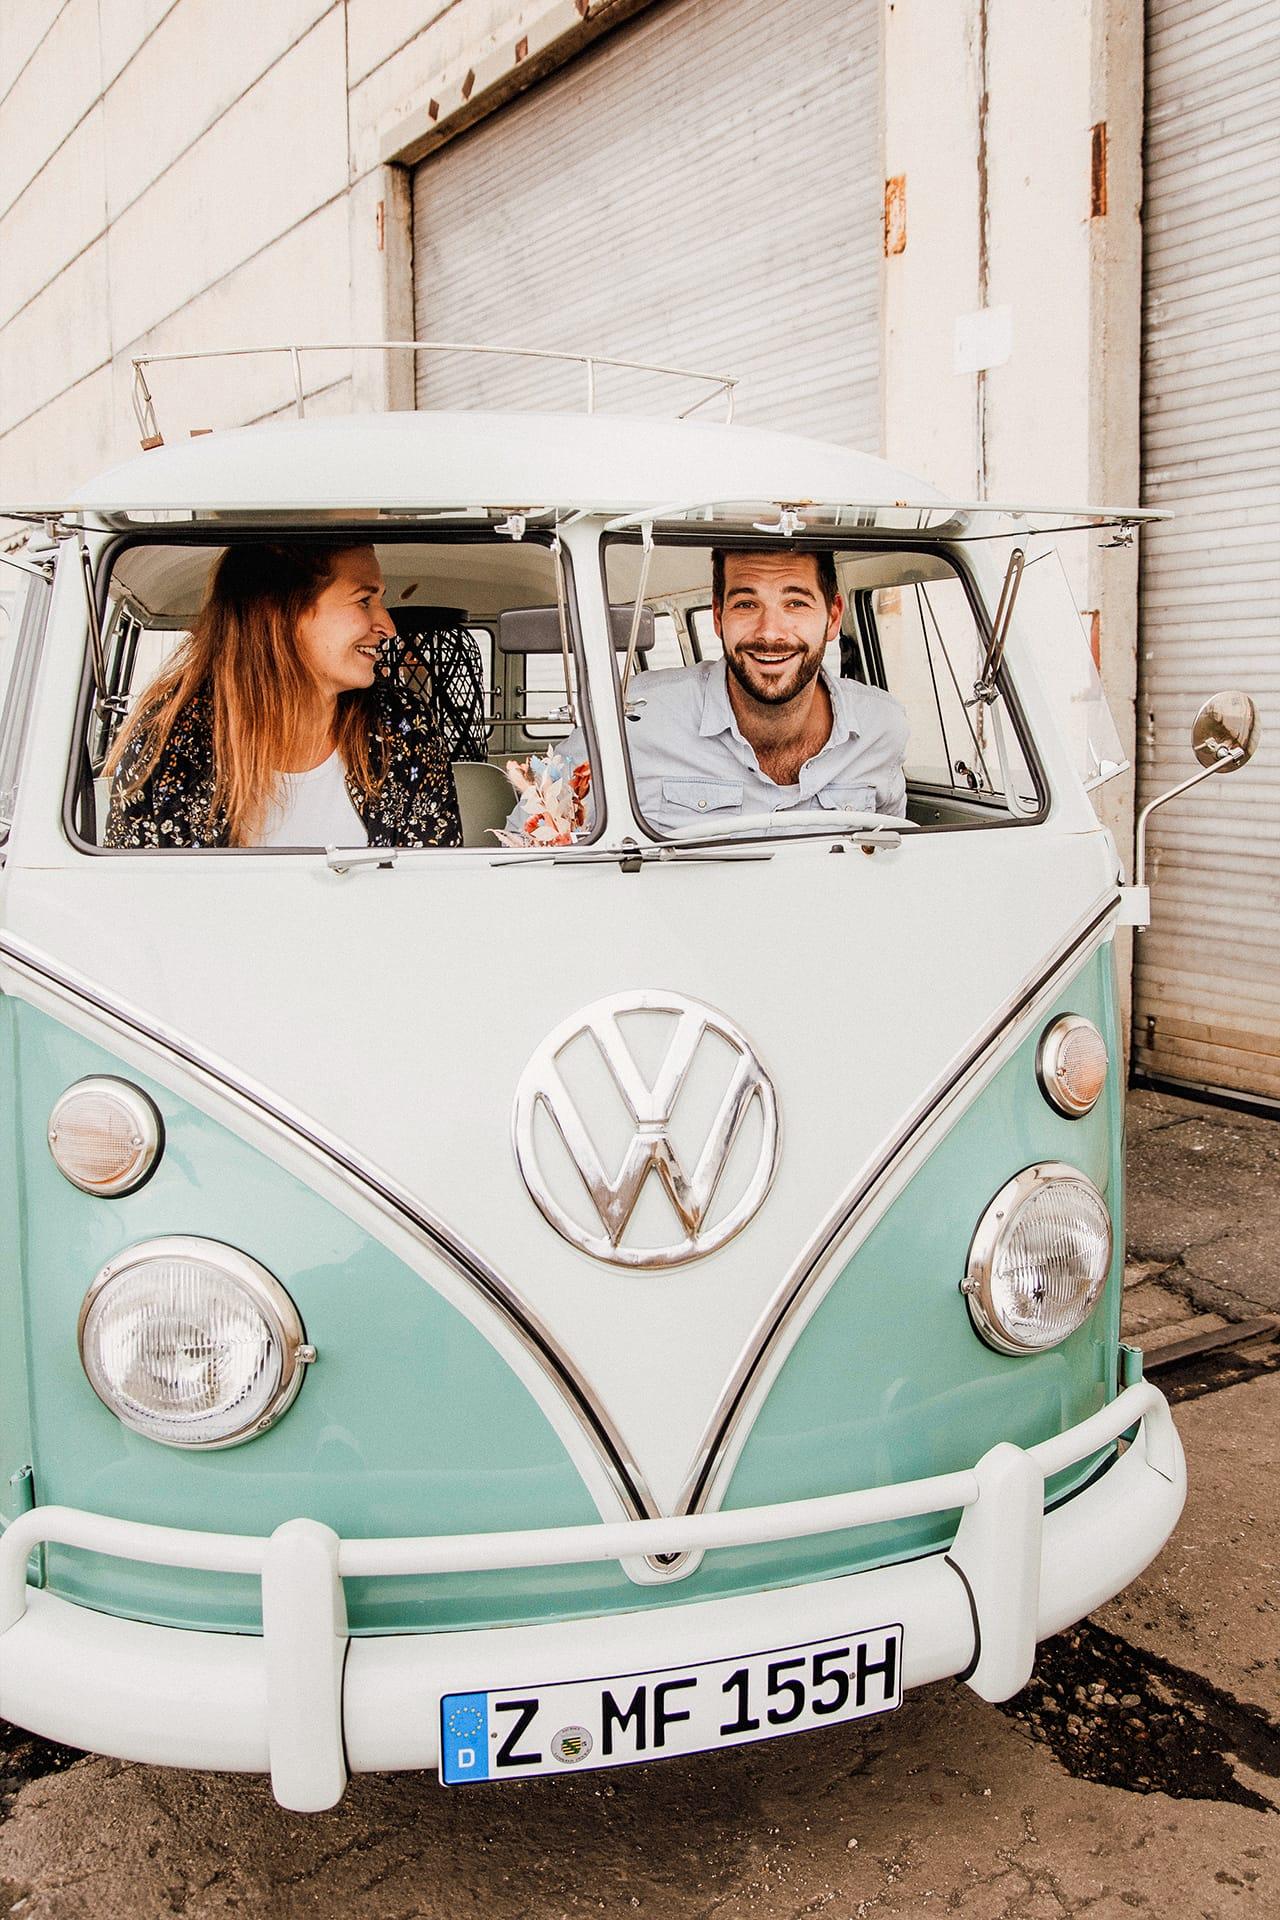 Volkswagen Bulli Retro Familienausflug Picknick Taxi Personenbeförderung Lederausstattung  Mieten Hochzeit